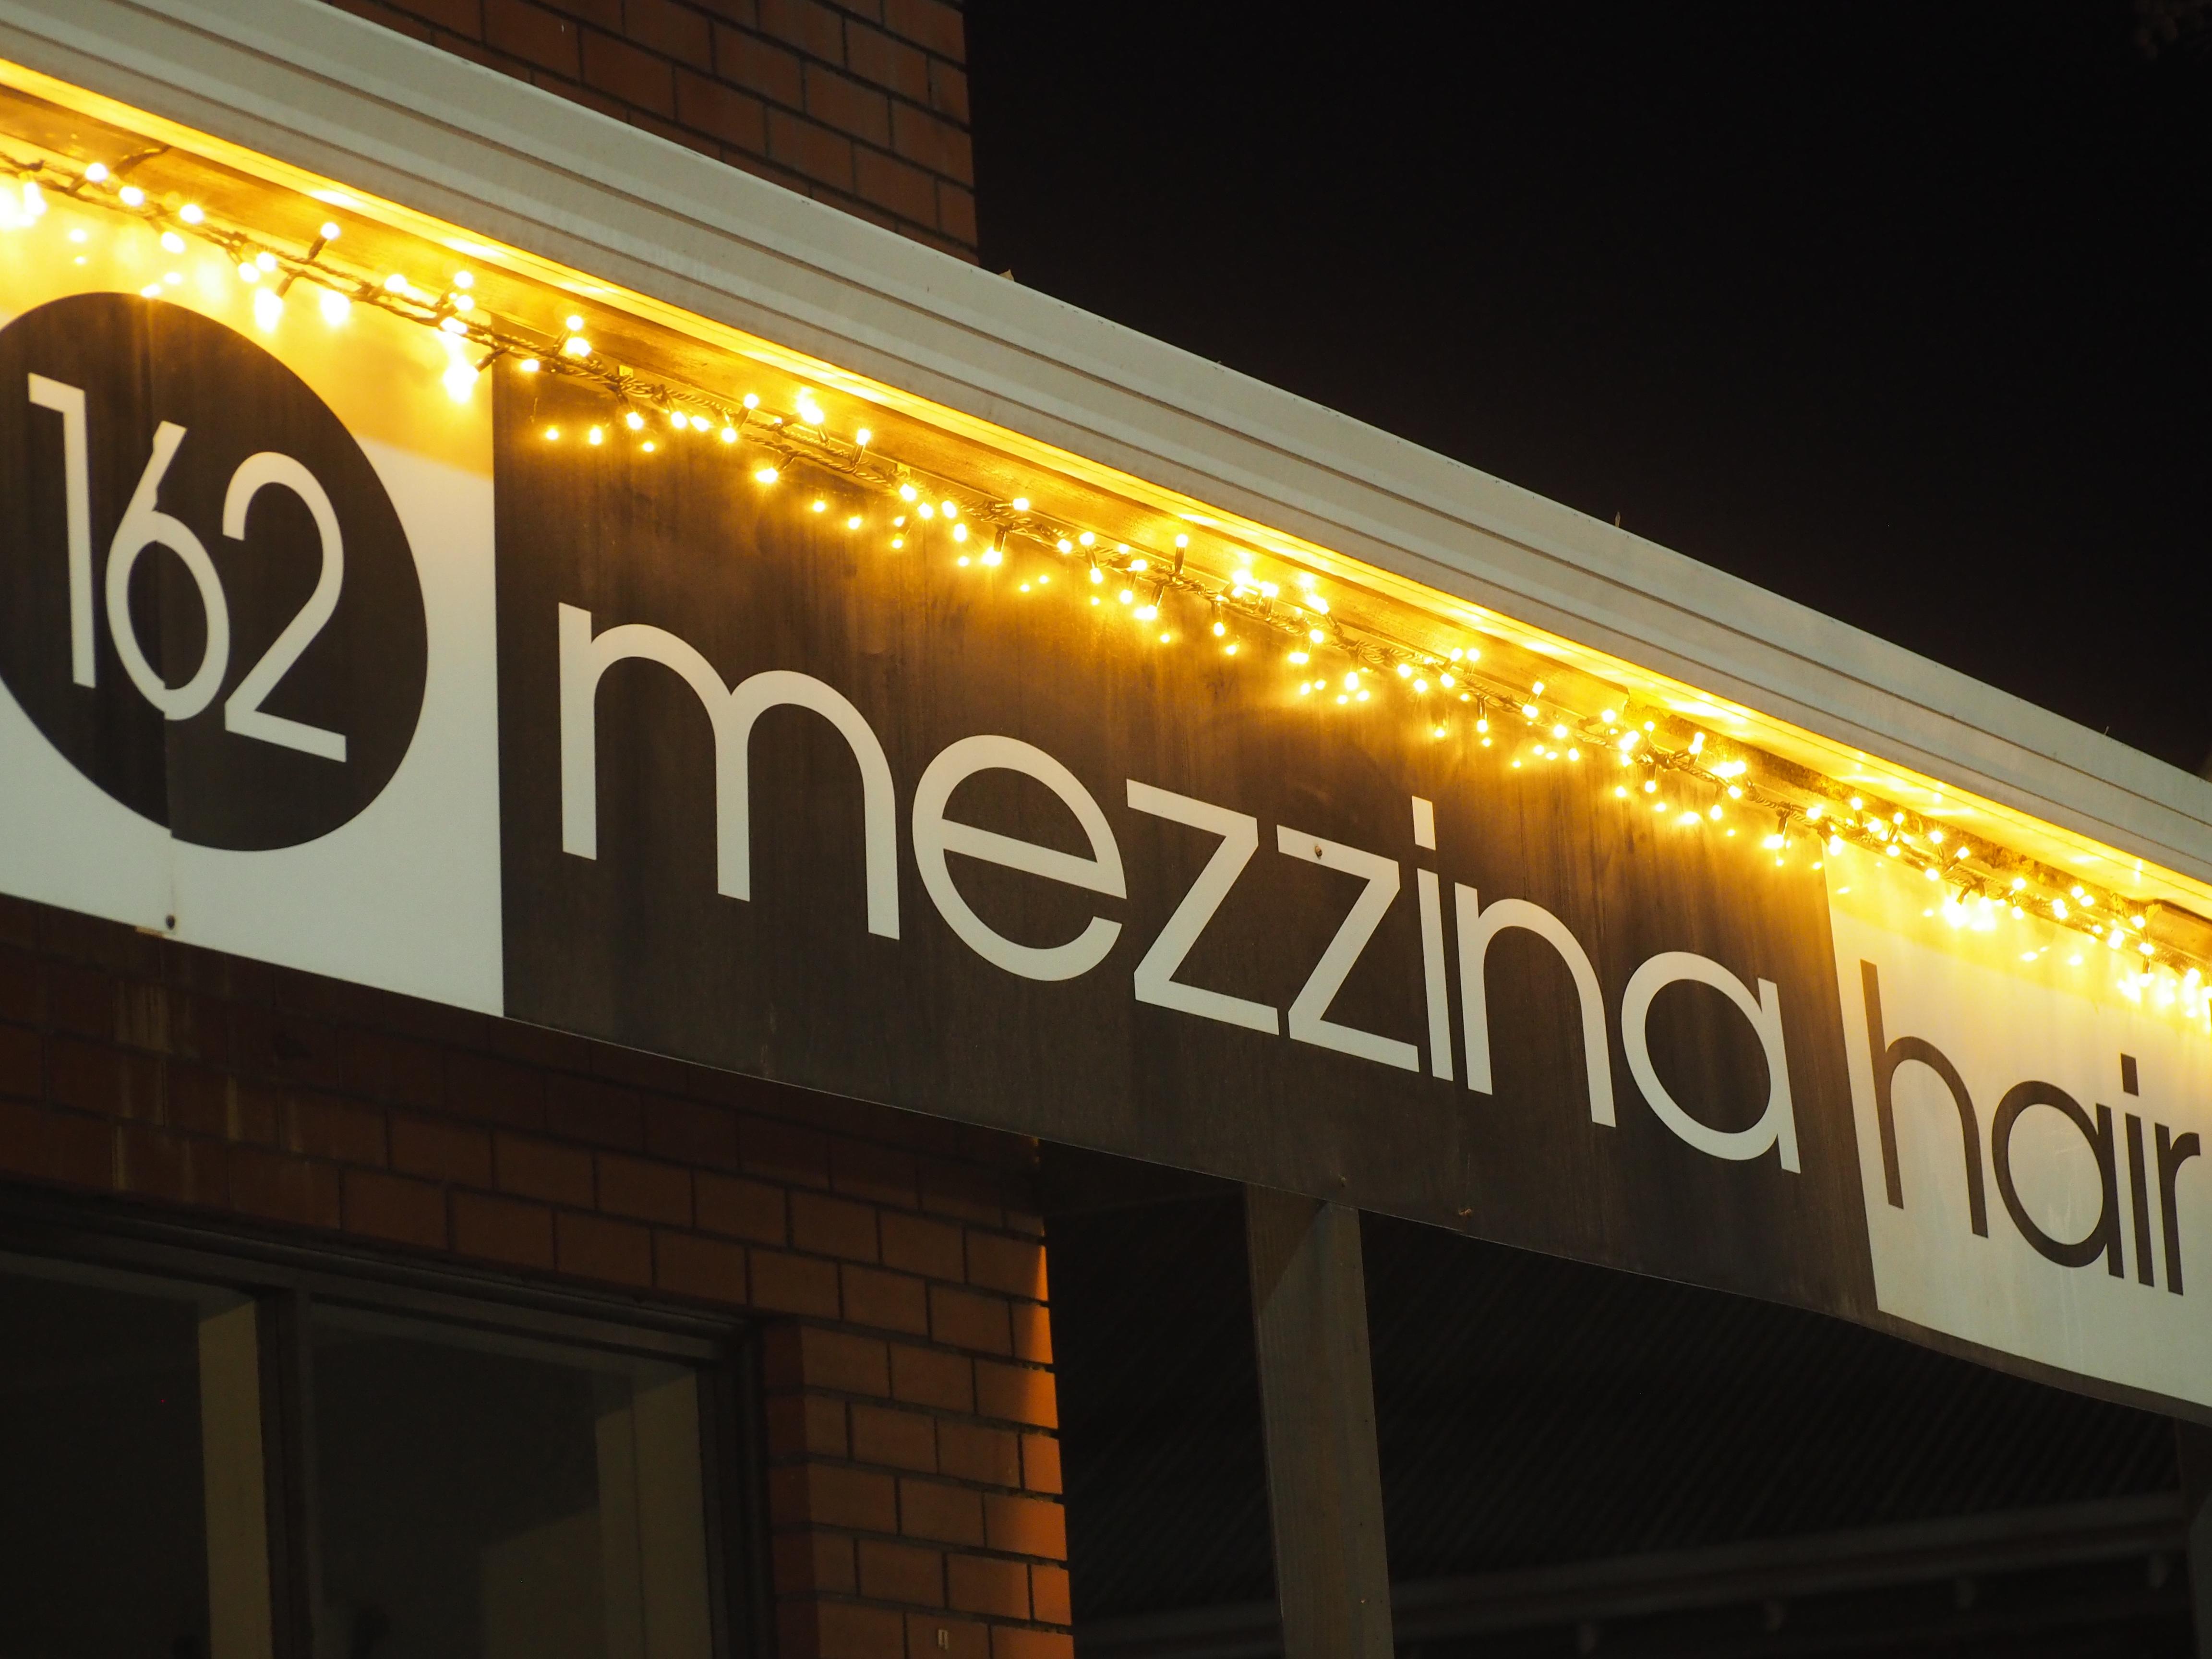 Lights on Mezzina Hair building